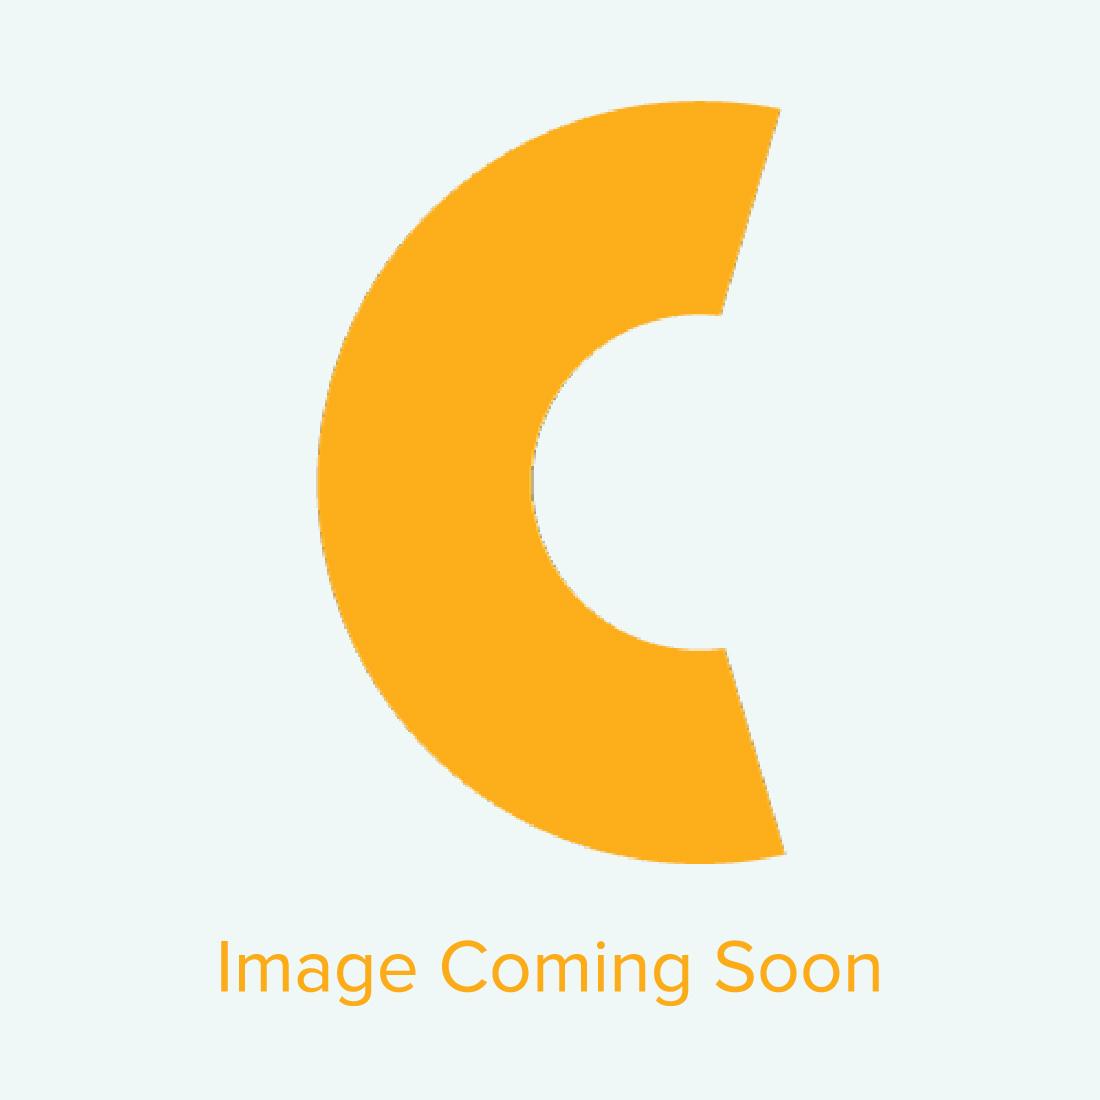 OKI Data C711WT Fusing Unit - Replacement Fuser Kit